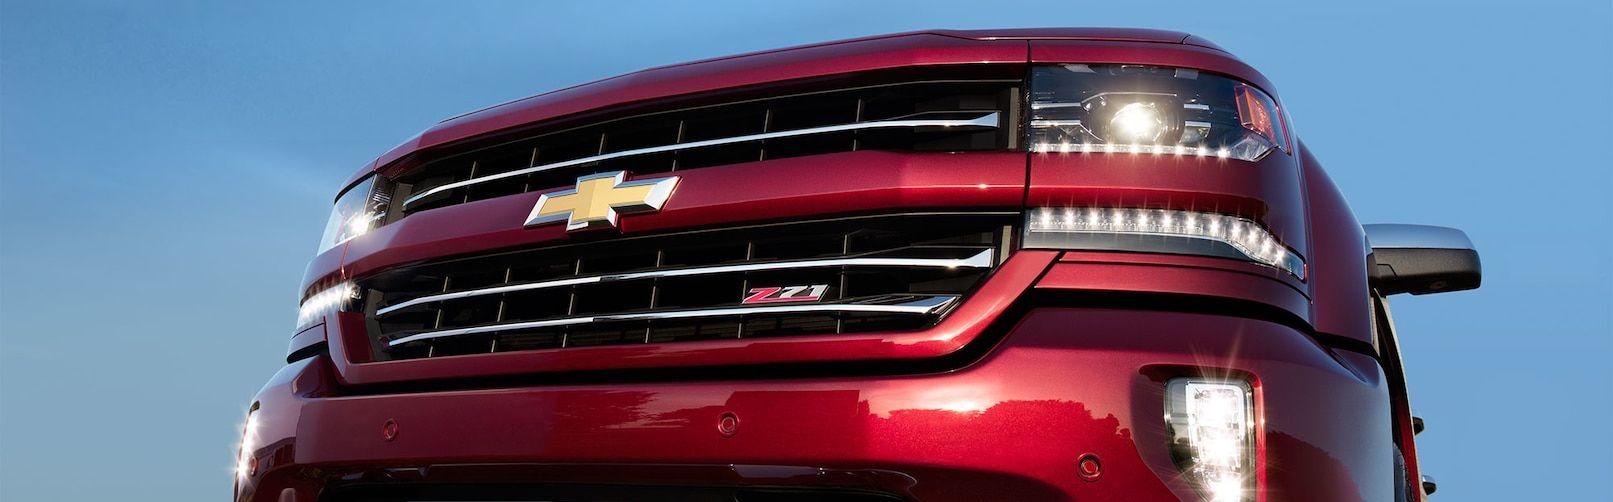 2018 Chevrolet Silverado 1500 Leasing in Austin, MN